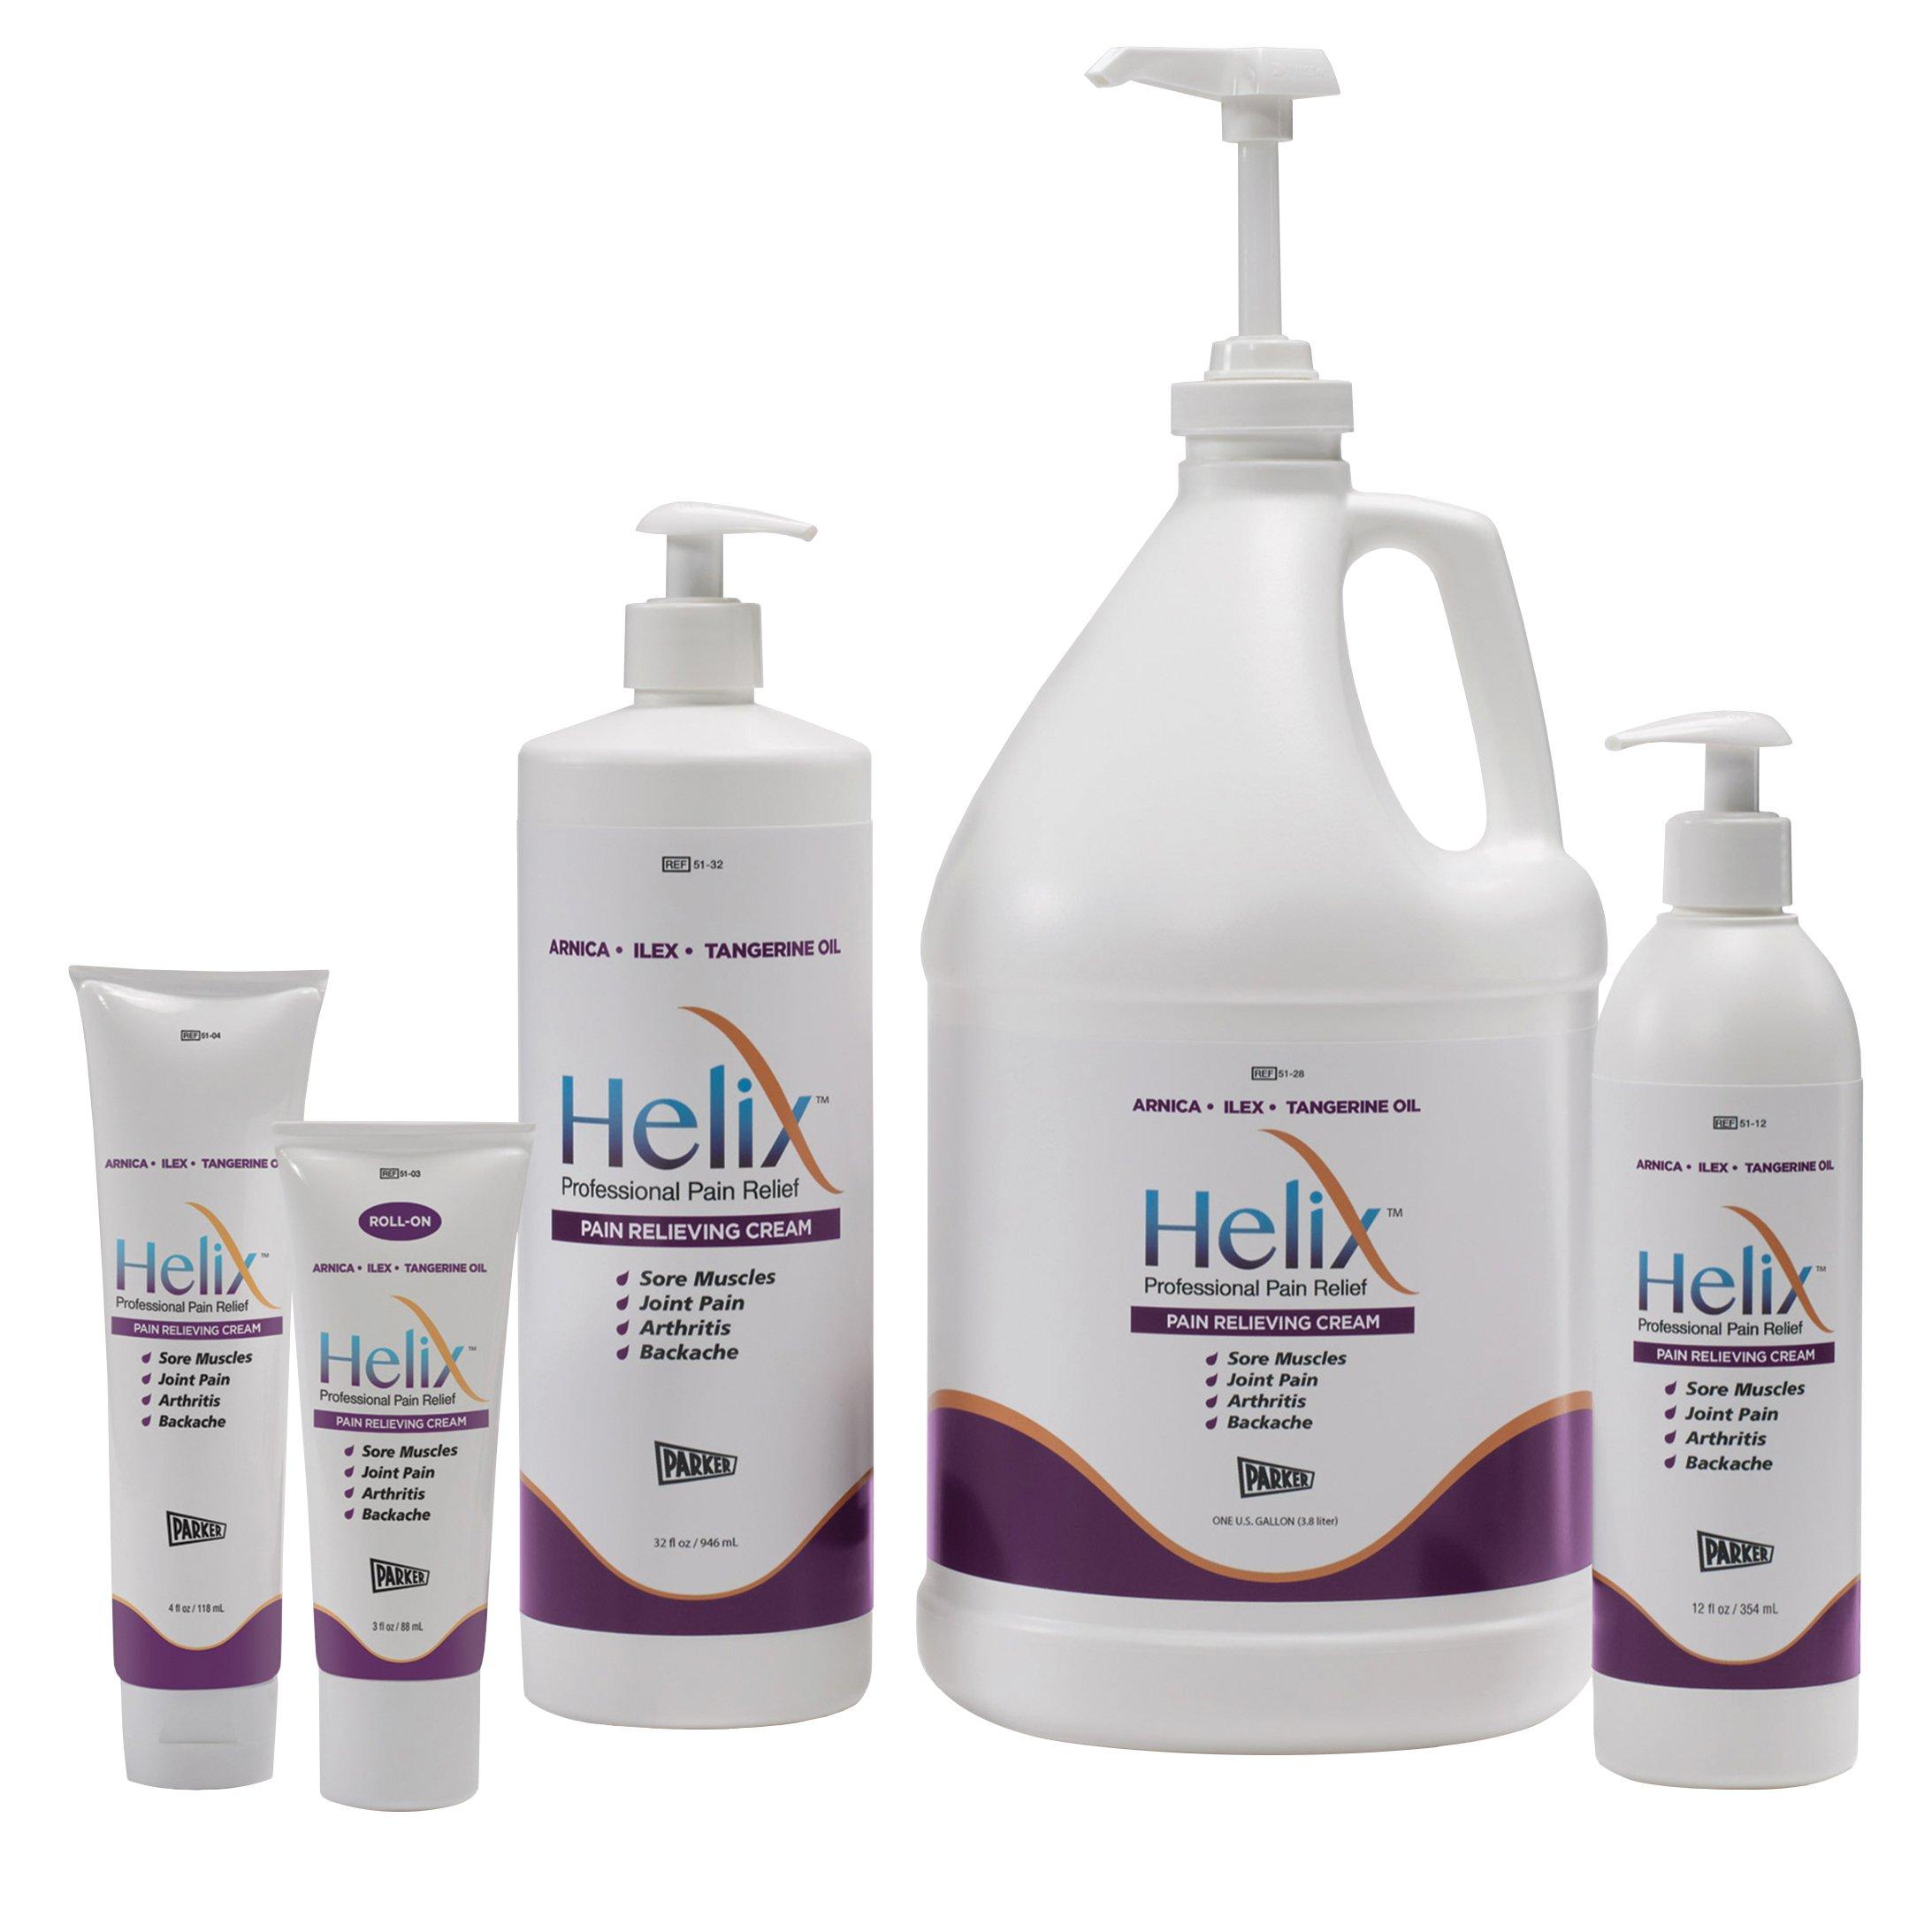 Parker Helix Pain Relieving Cream